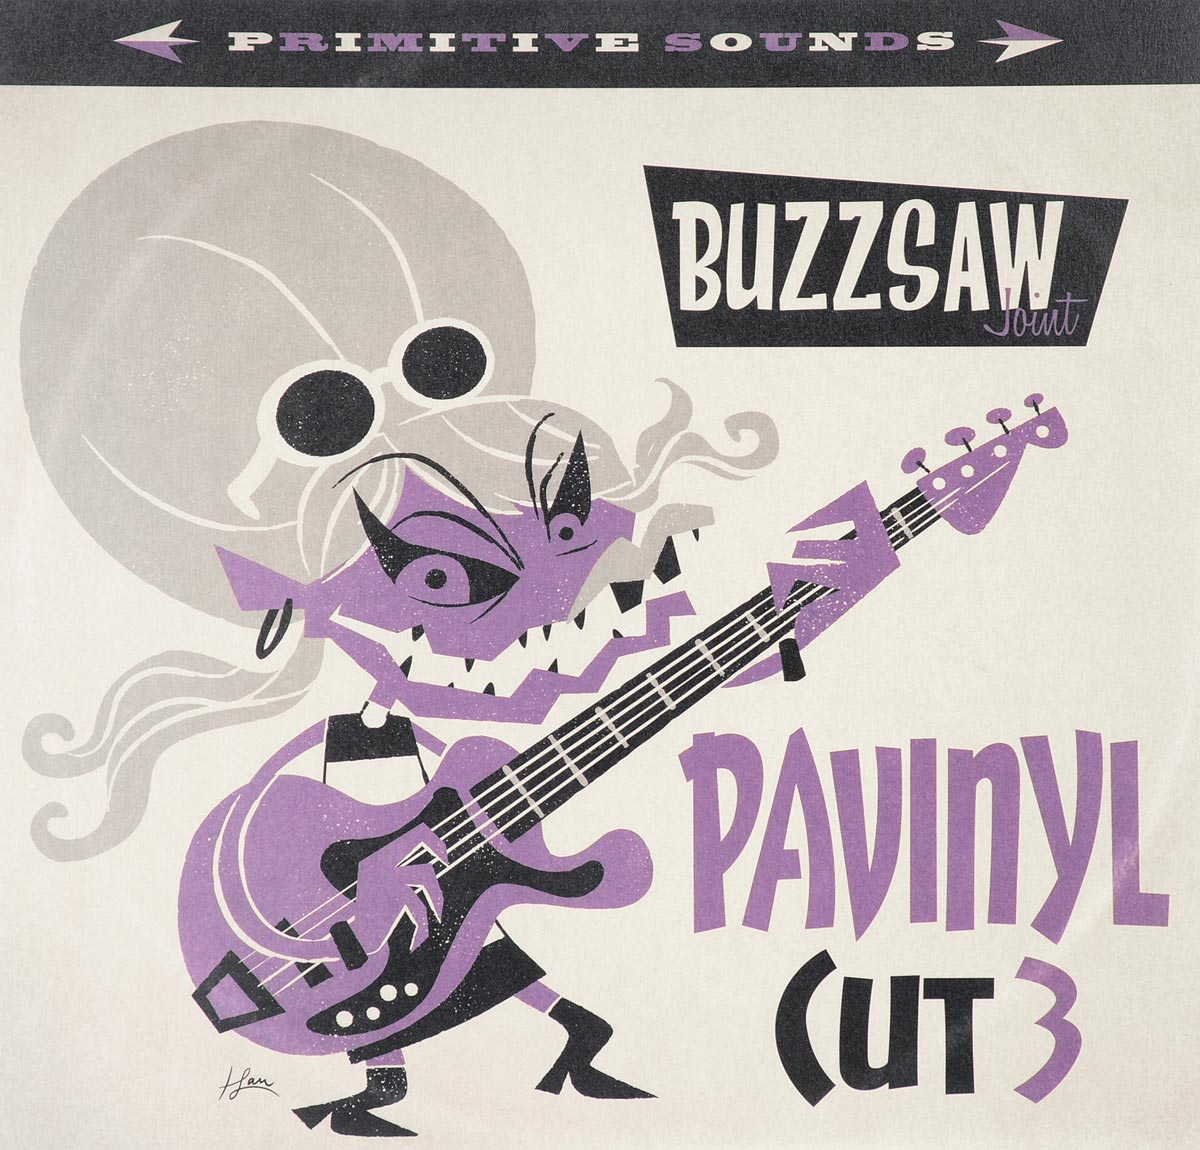 Buzzsaw Joint Cut 03 (LP) ботинки grinders stag киев